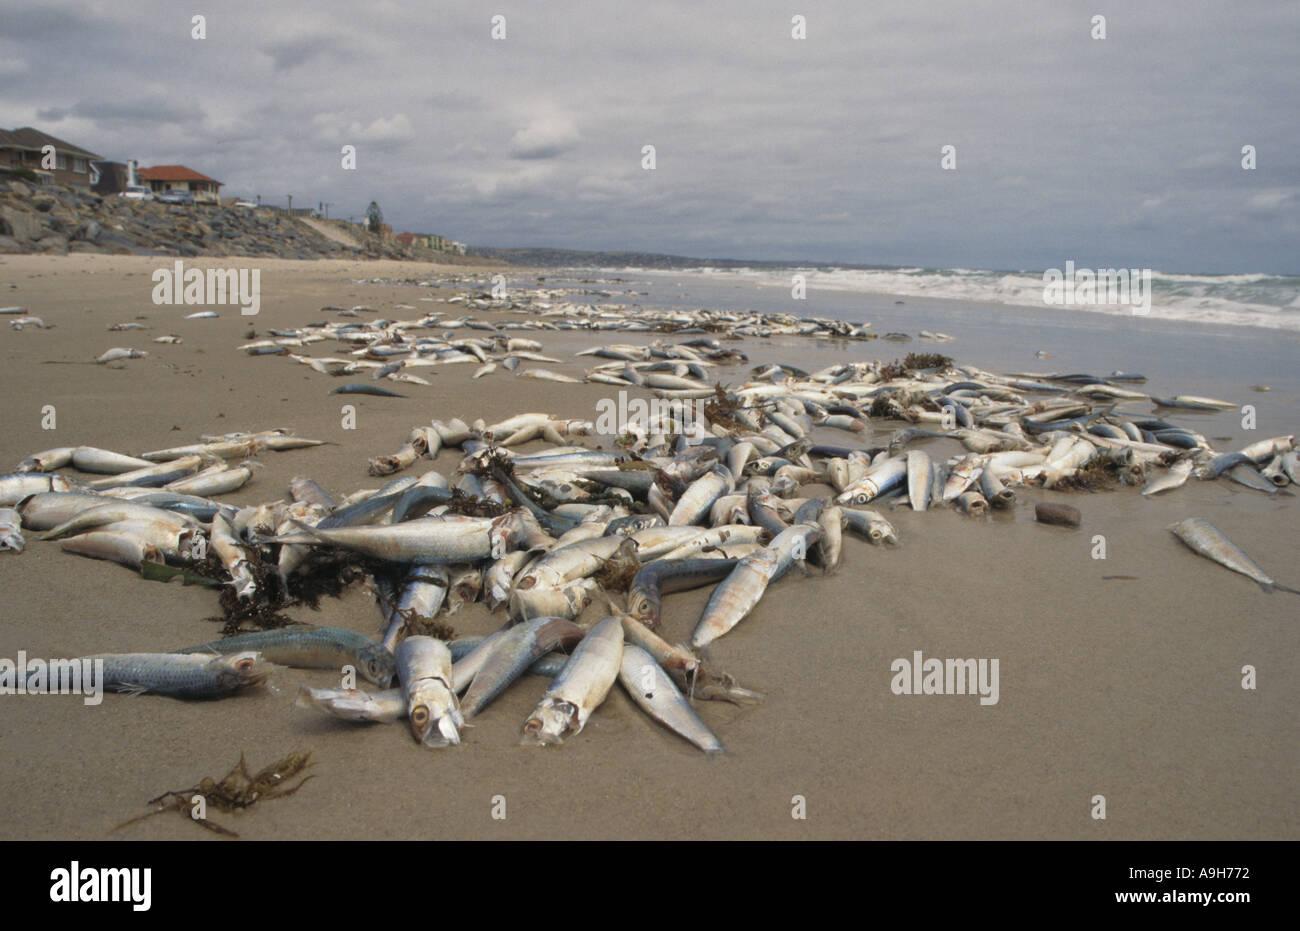 Pollution Dead Fish Pilchards dead on seashore South Australia - Stock Image